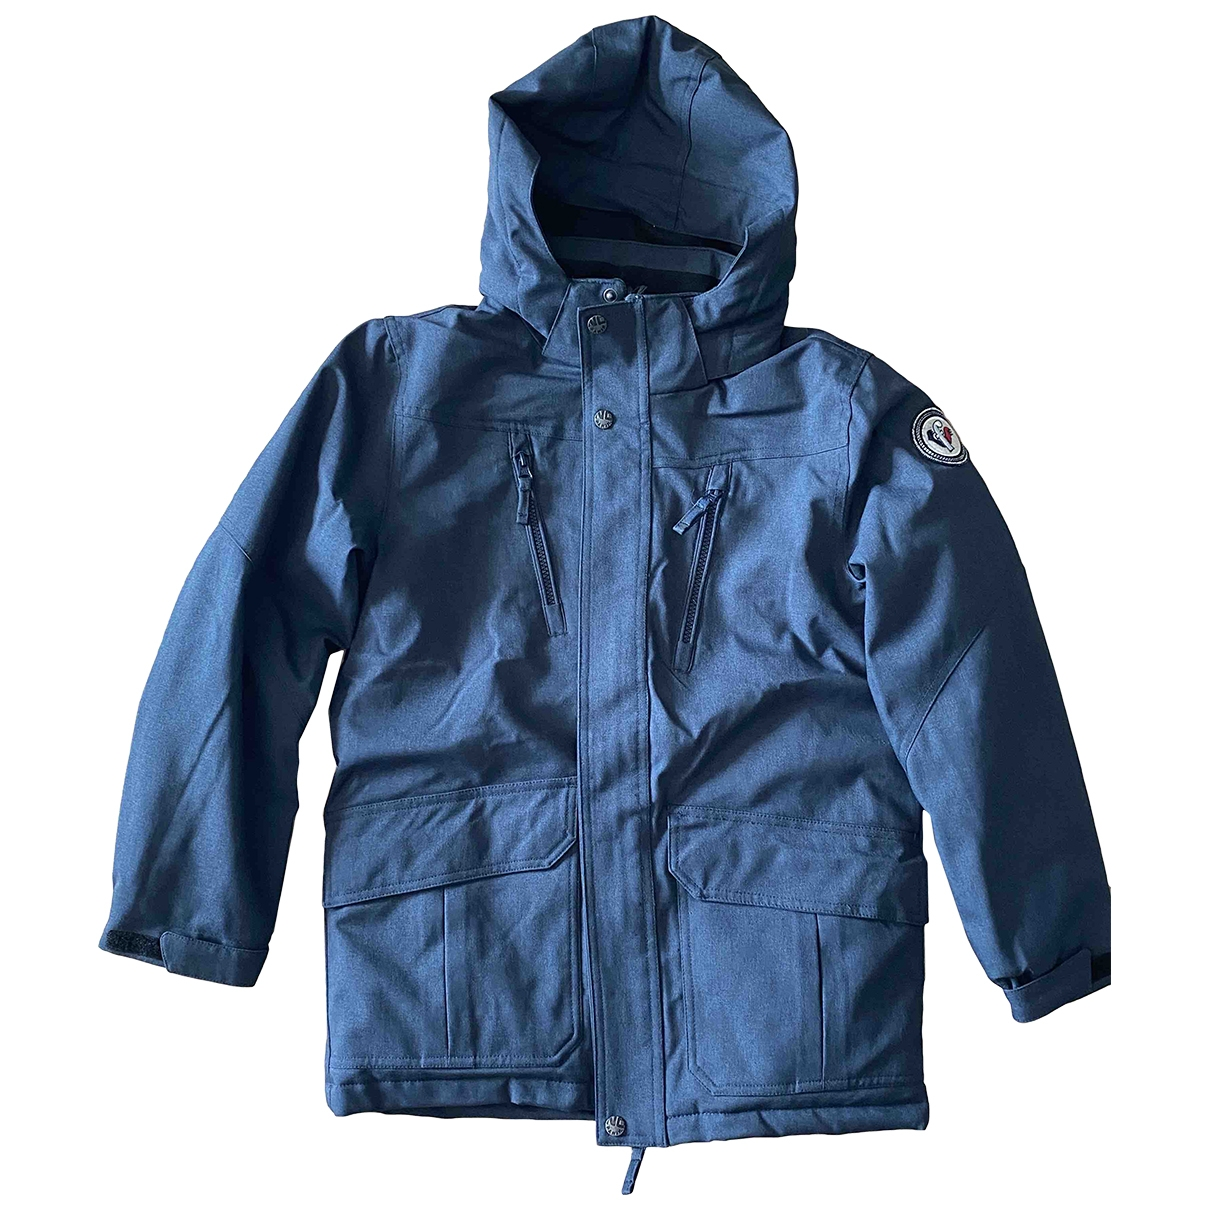 Fusalp \N Blue jacket & coat for Kids 12 years - XS FR